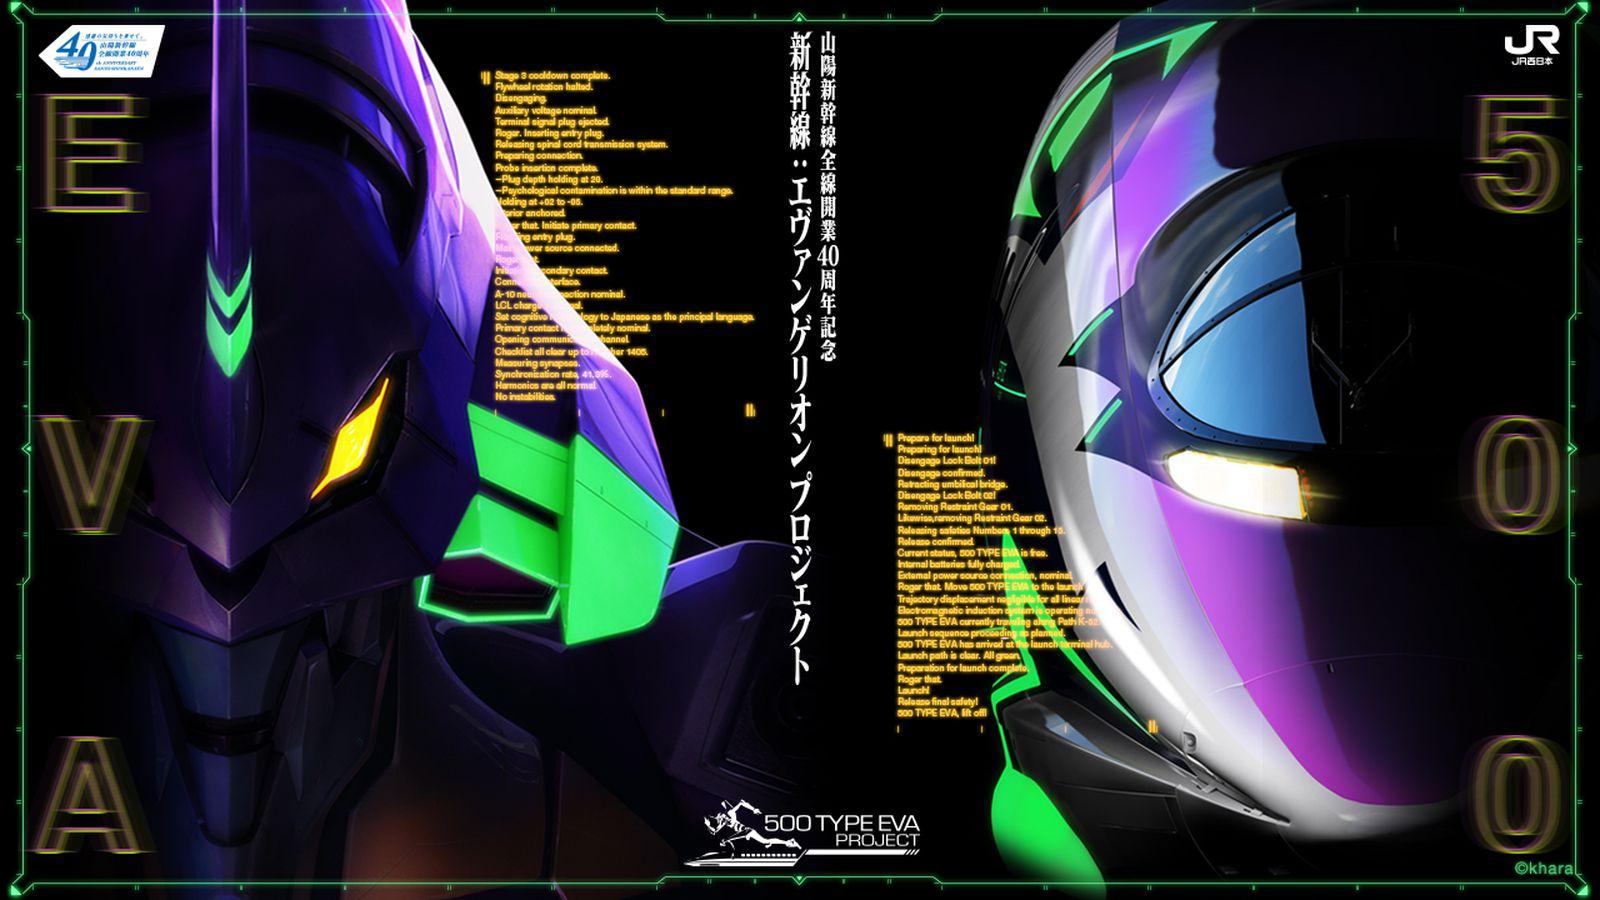 Iphone X The Verge Wallpaper Japanese Bullet Train To Cosplay As Neon Genesis